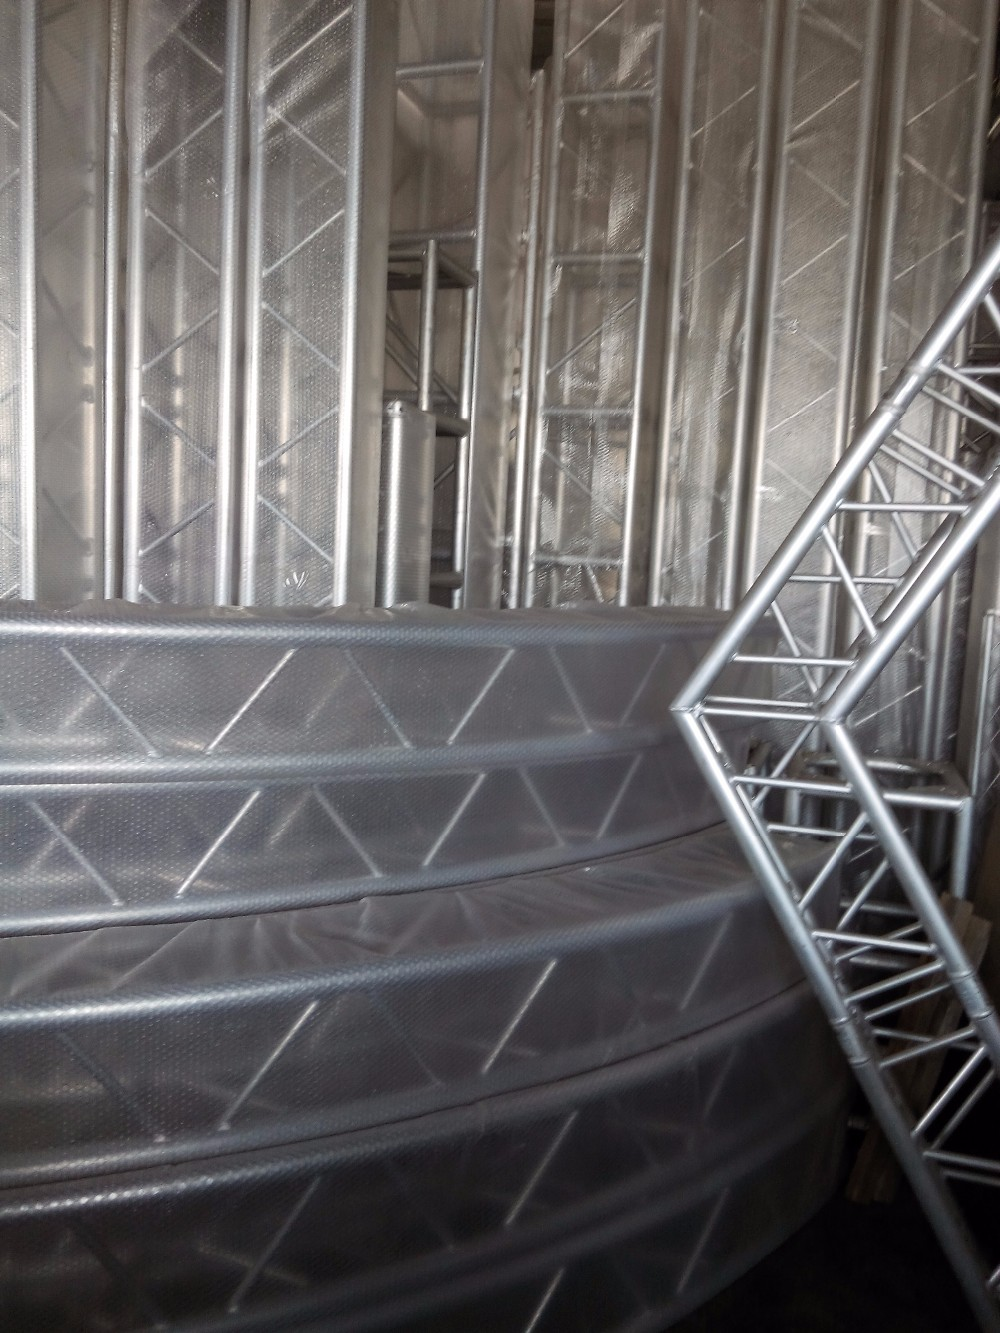 Design aluminum stage frame truss structure for catwalk for Buy trusses